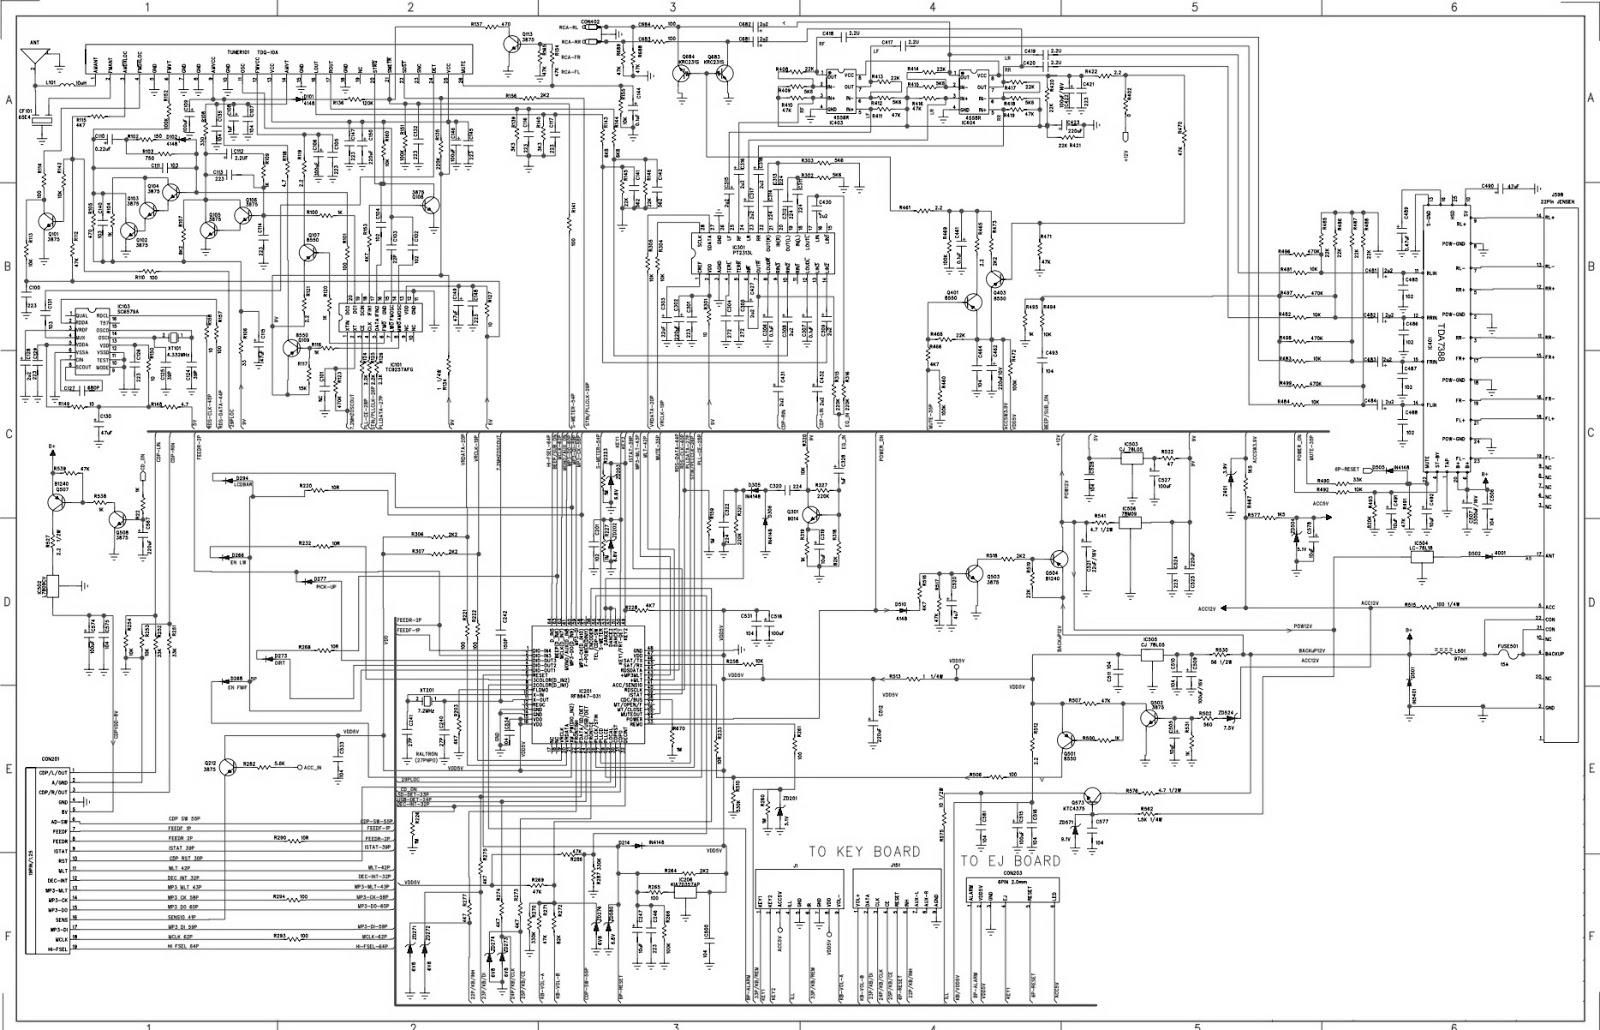 Electro Help Hyundai H Cdm Car Stereo Circuit Diagram